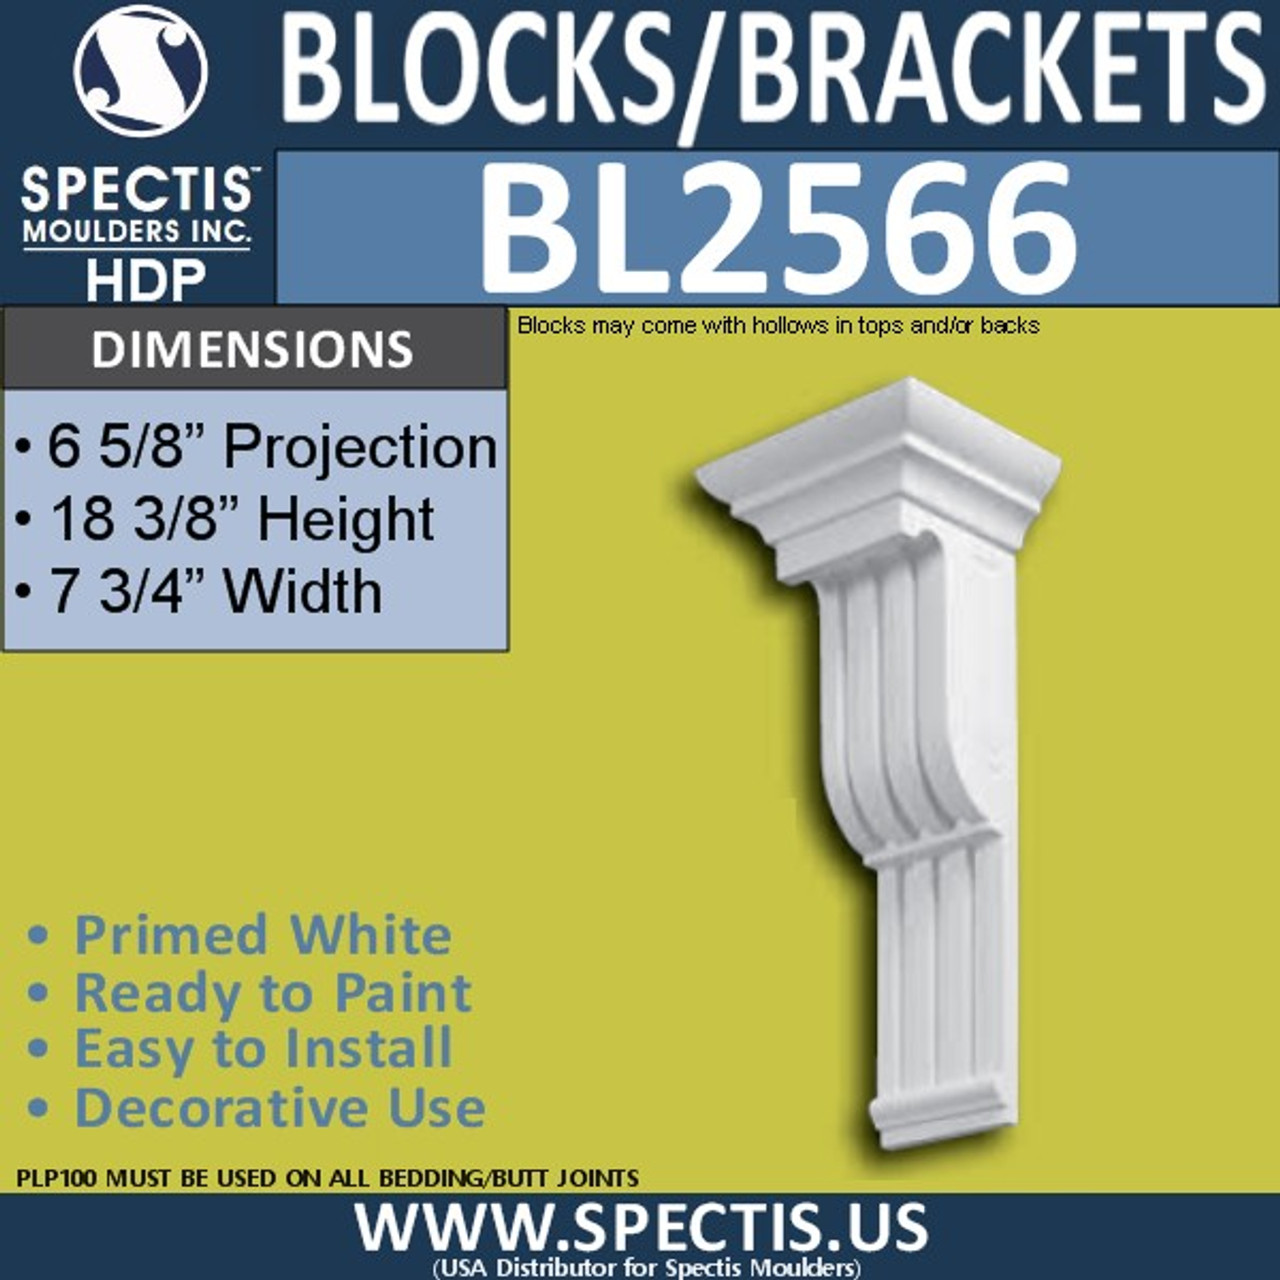 "BL2566 Eave Block or Bracket 7.75""W x 18.5""H x 6.5"" P"